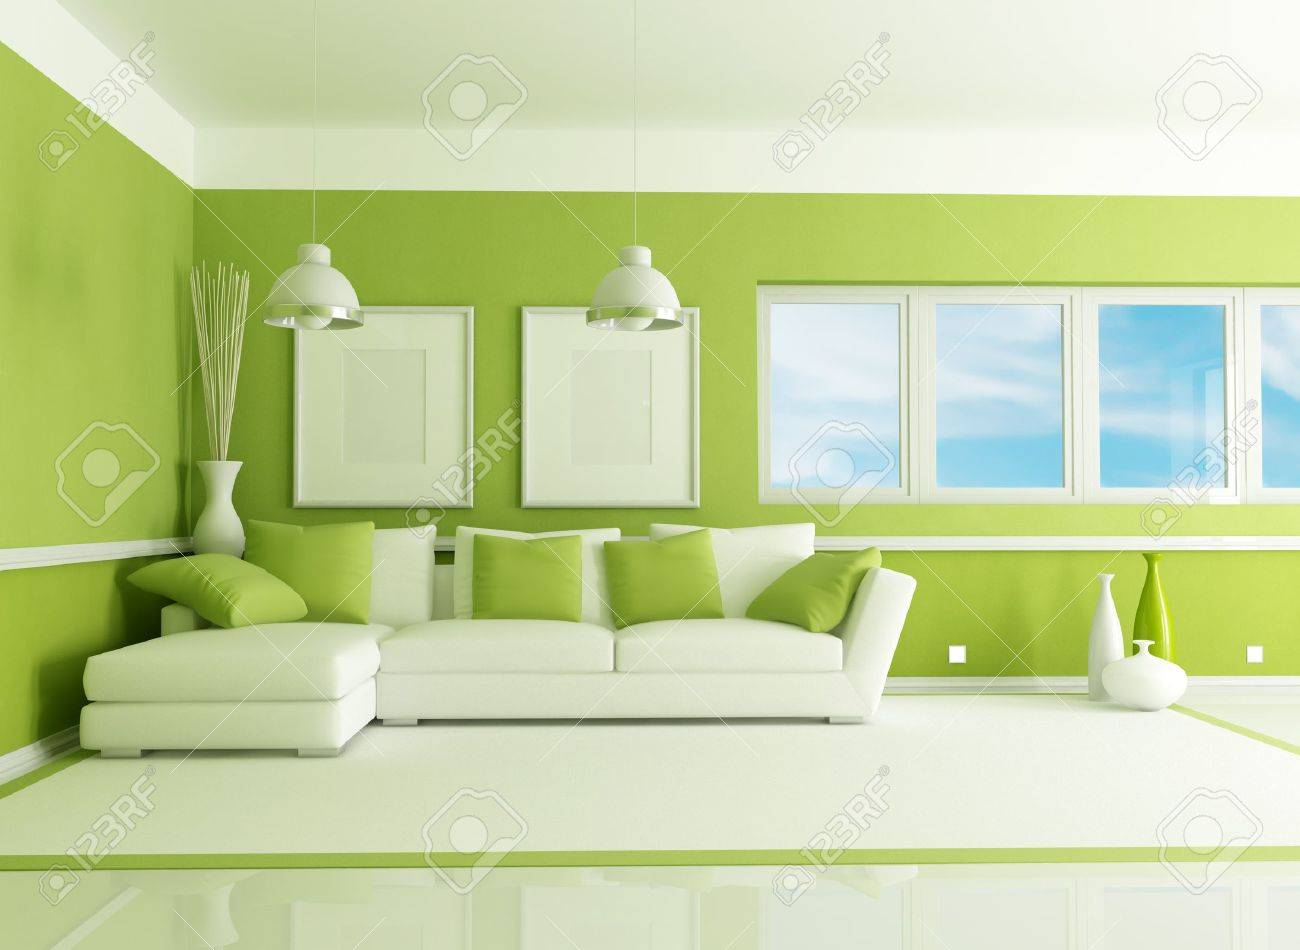 Salon Vert Contemporain Avec Canape D Angle Rendu